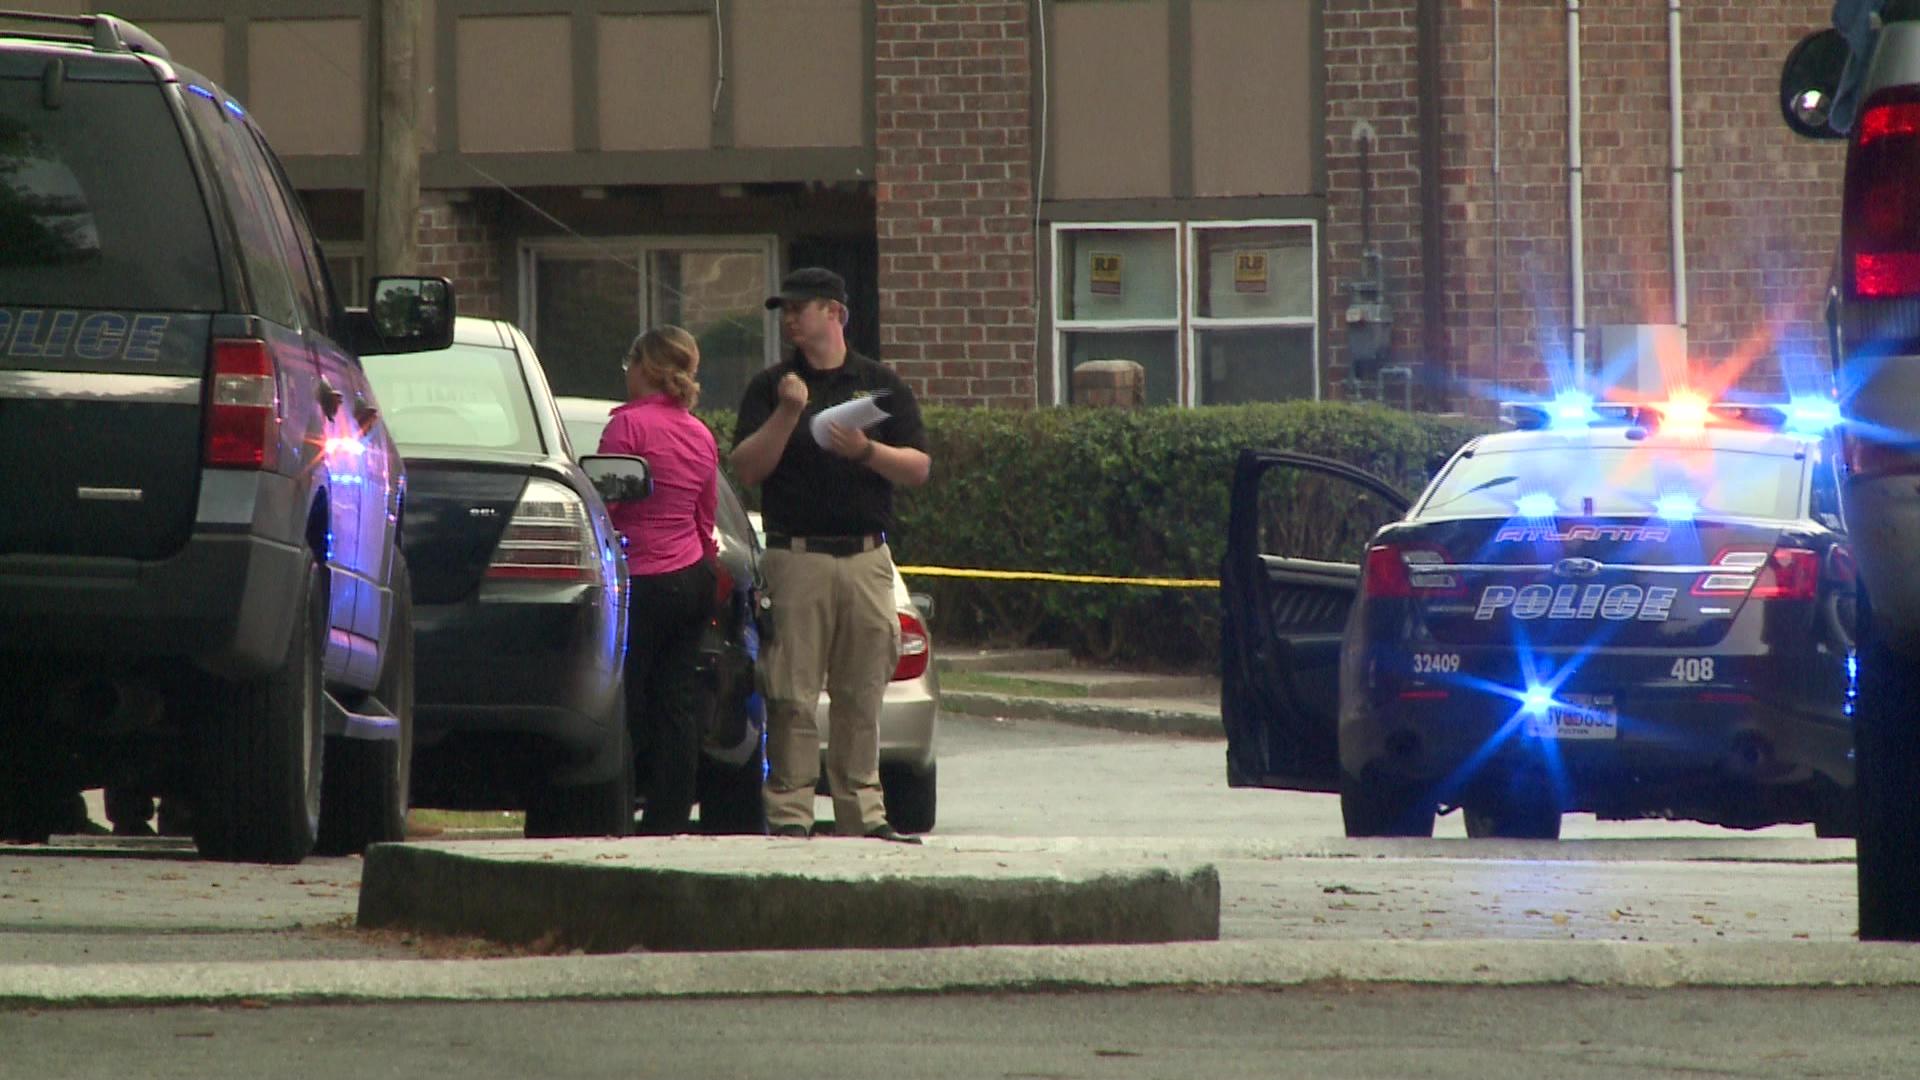 Car Wash Atlanta: Dispute Allegedly Erupts While Men Wash Car